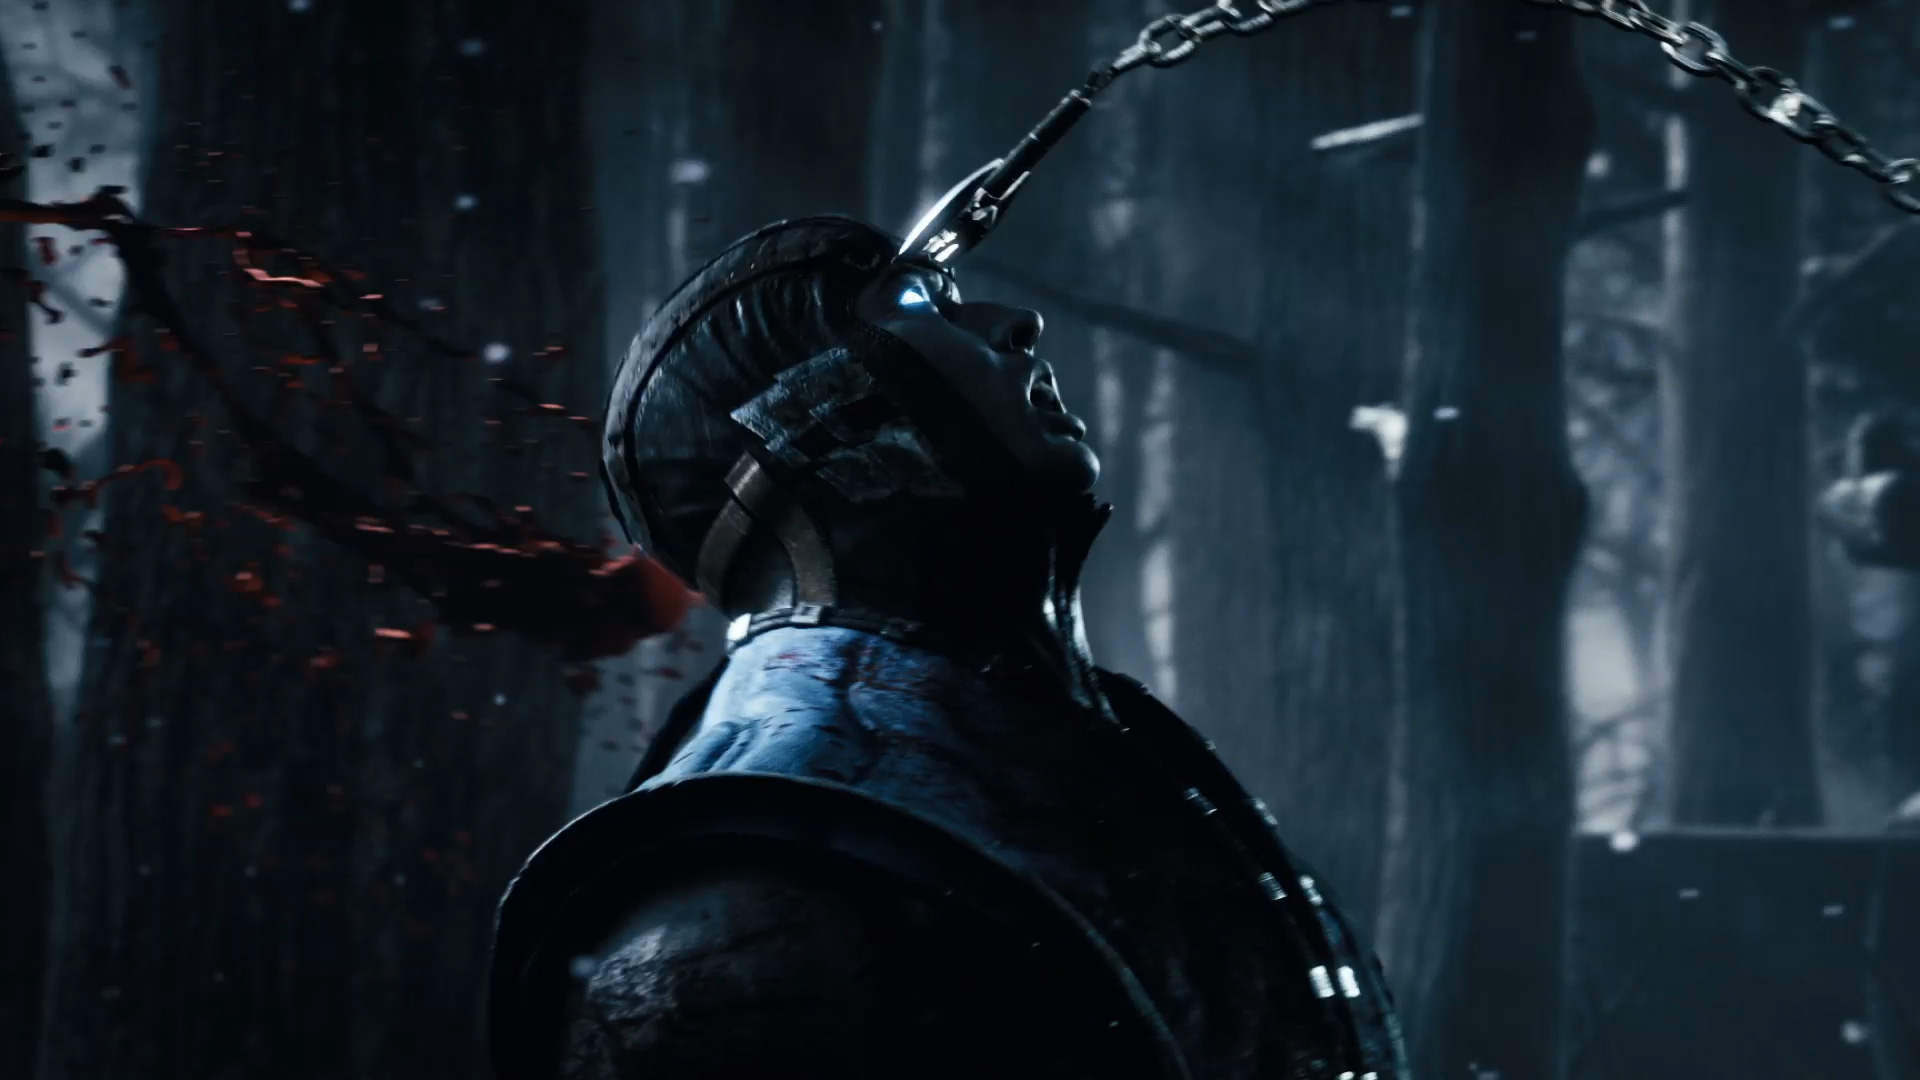 Mortal Kombat X Wallpaper 9